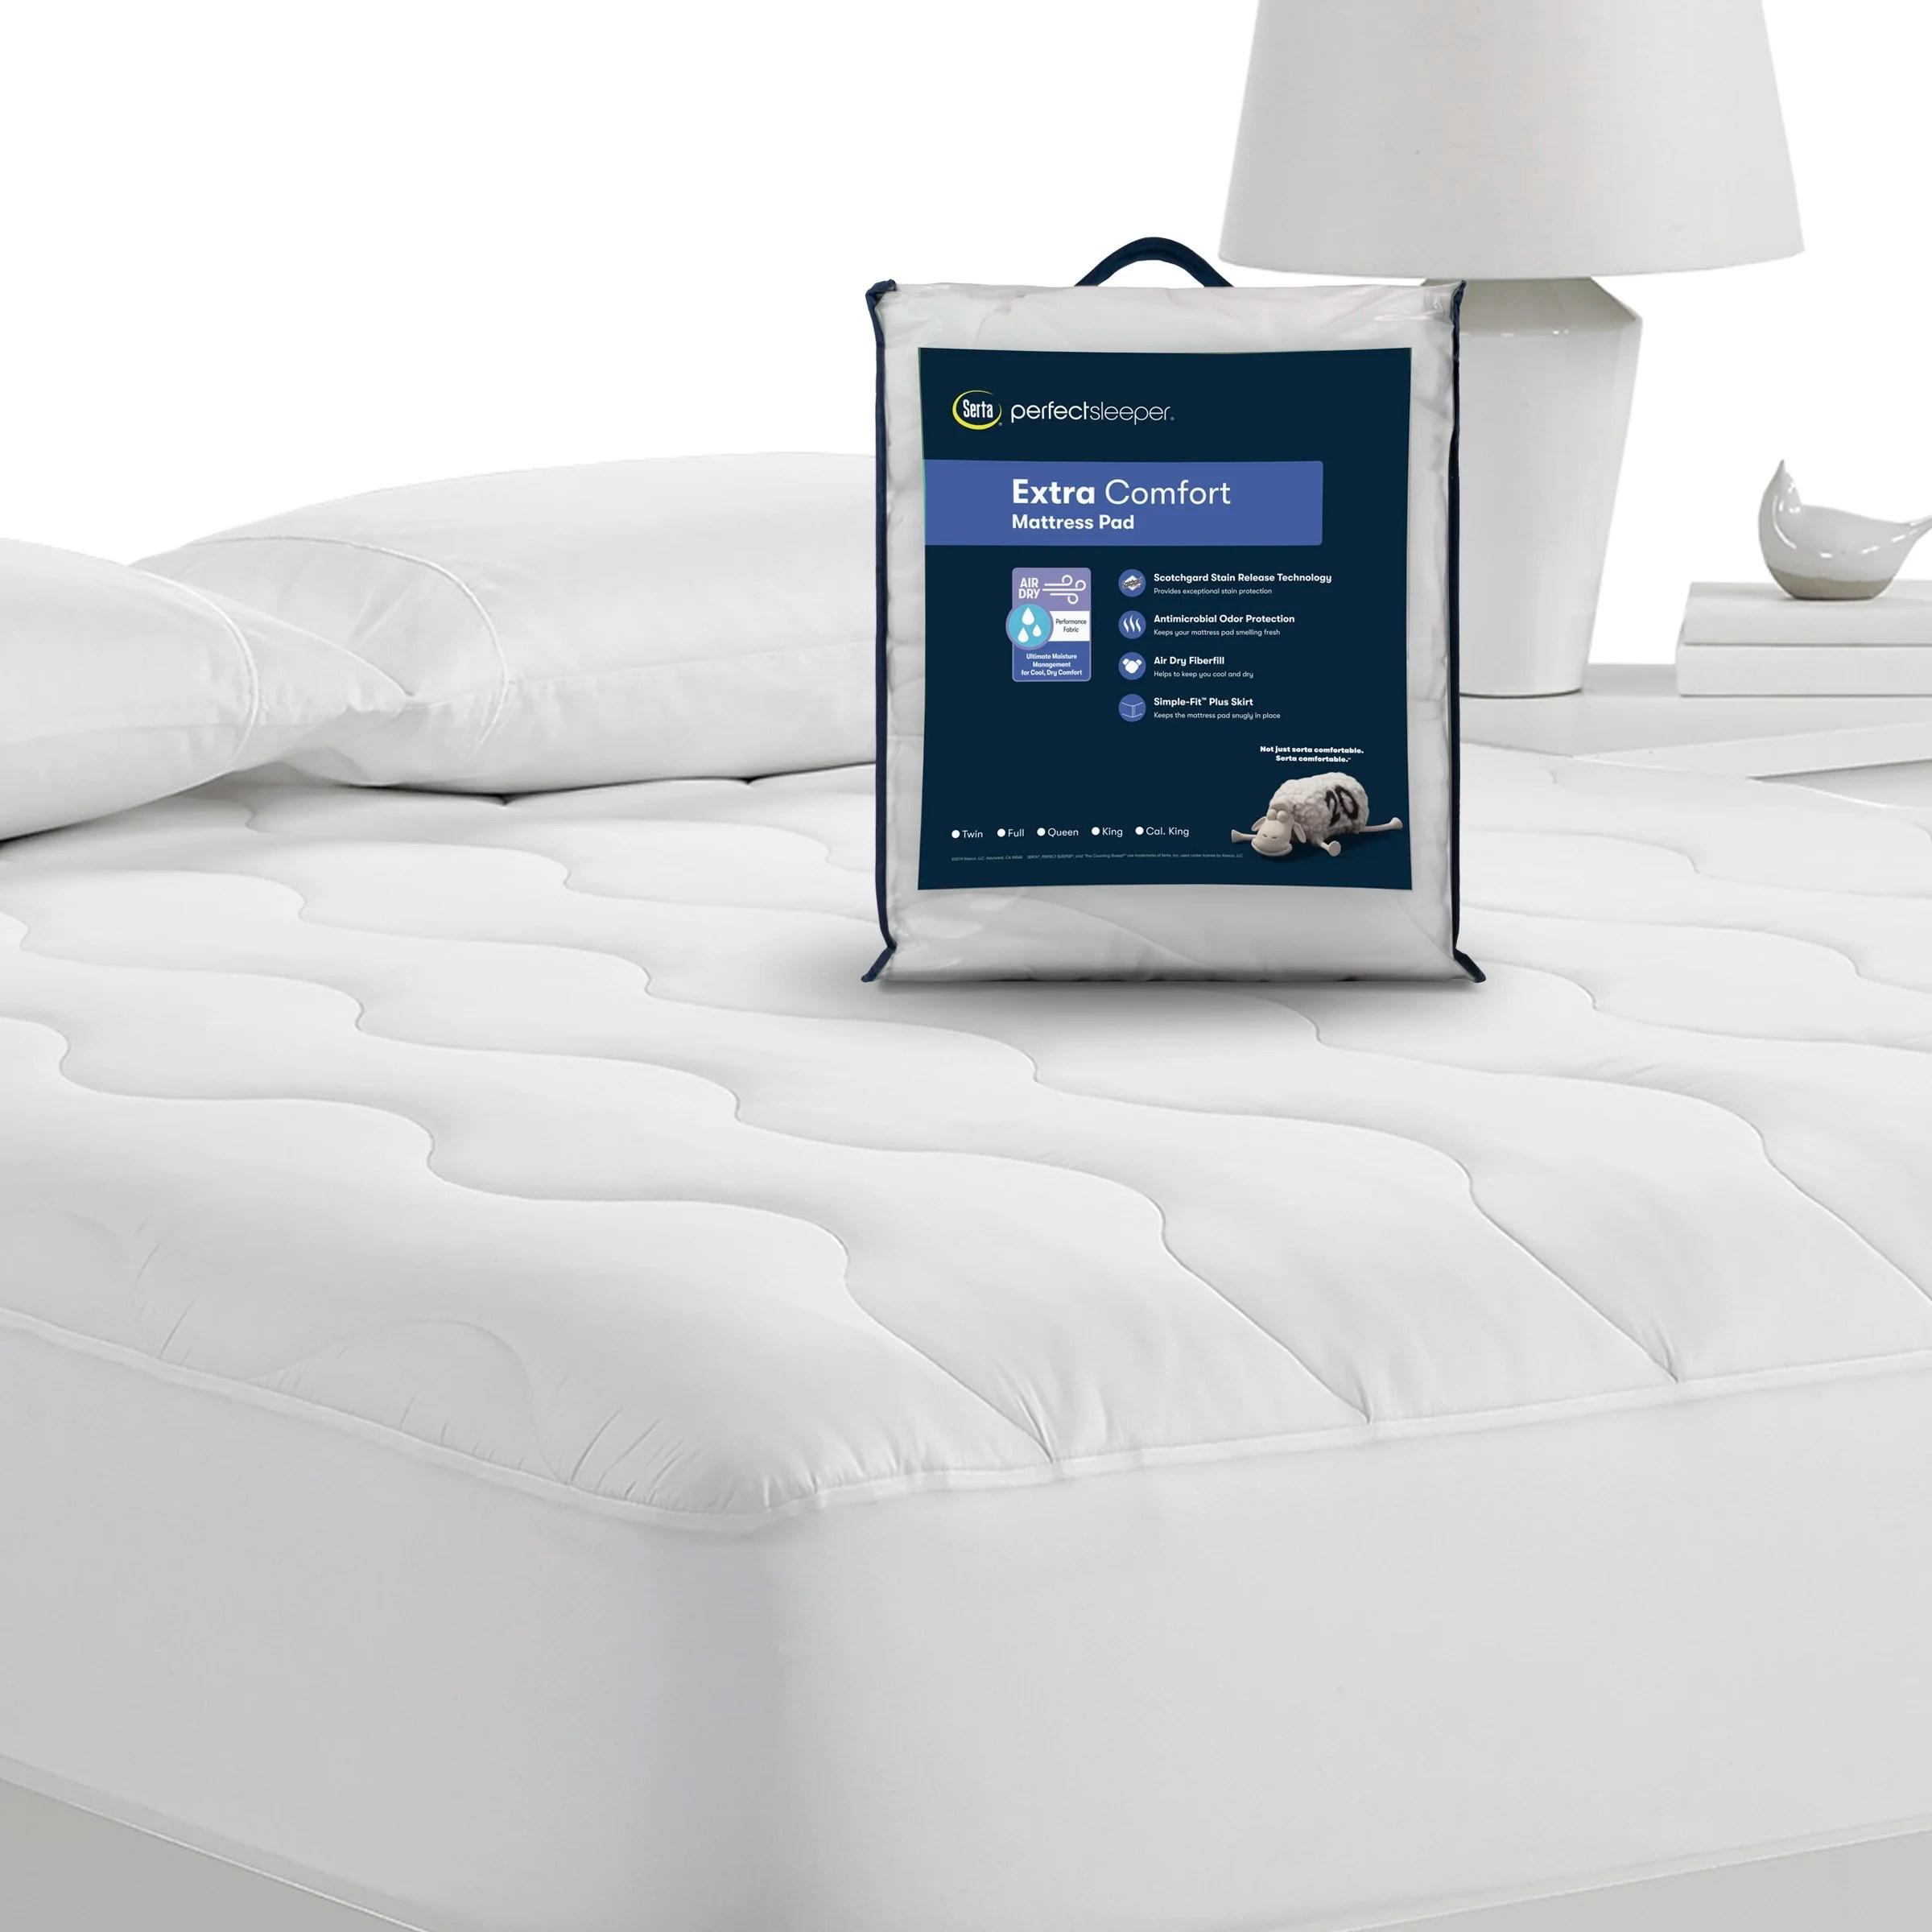 air dry extra comfort mattress pad